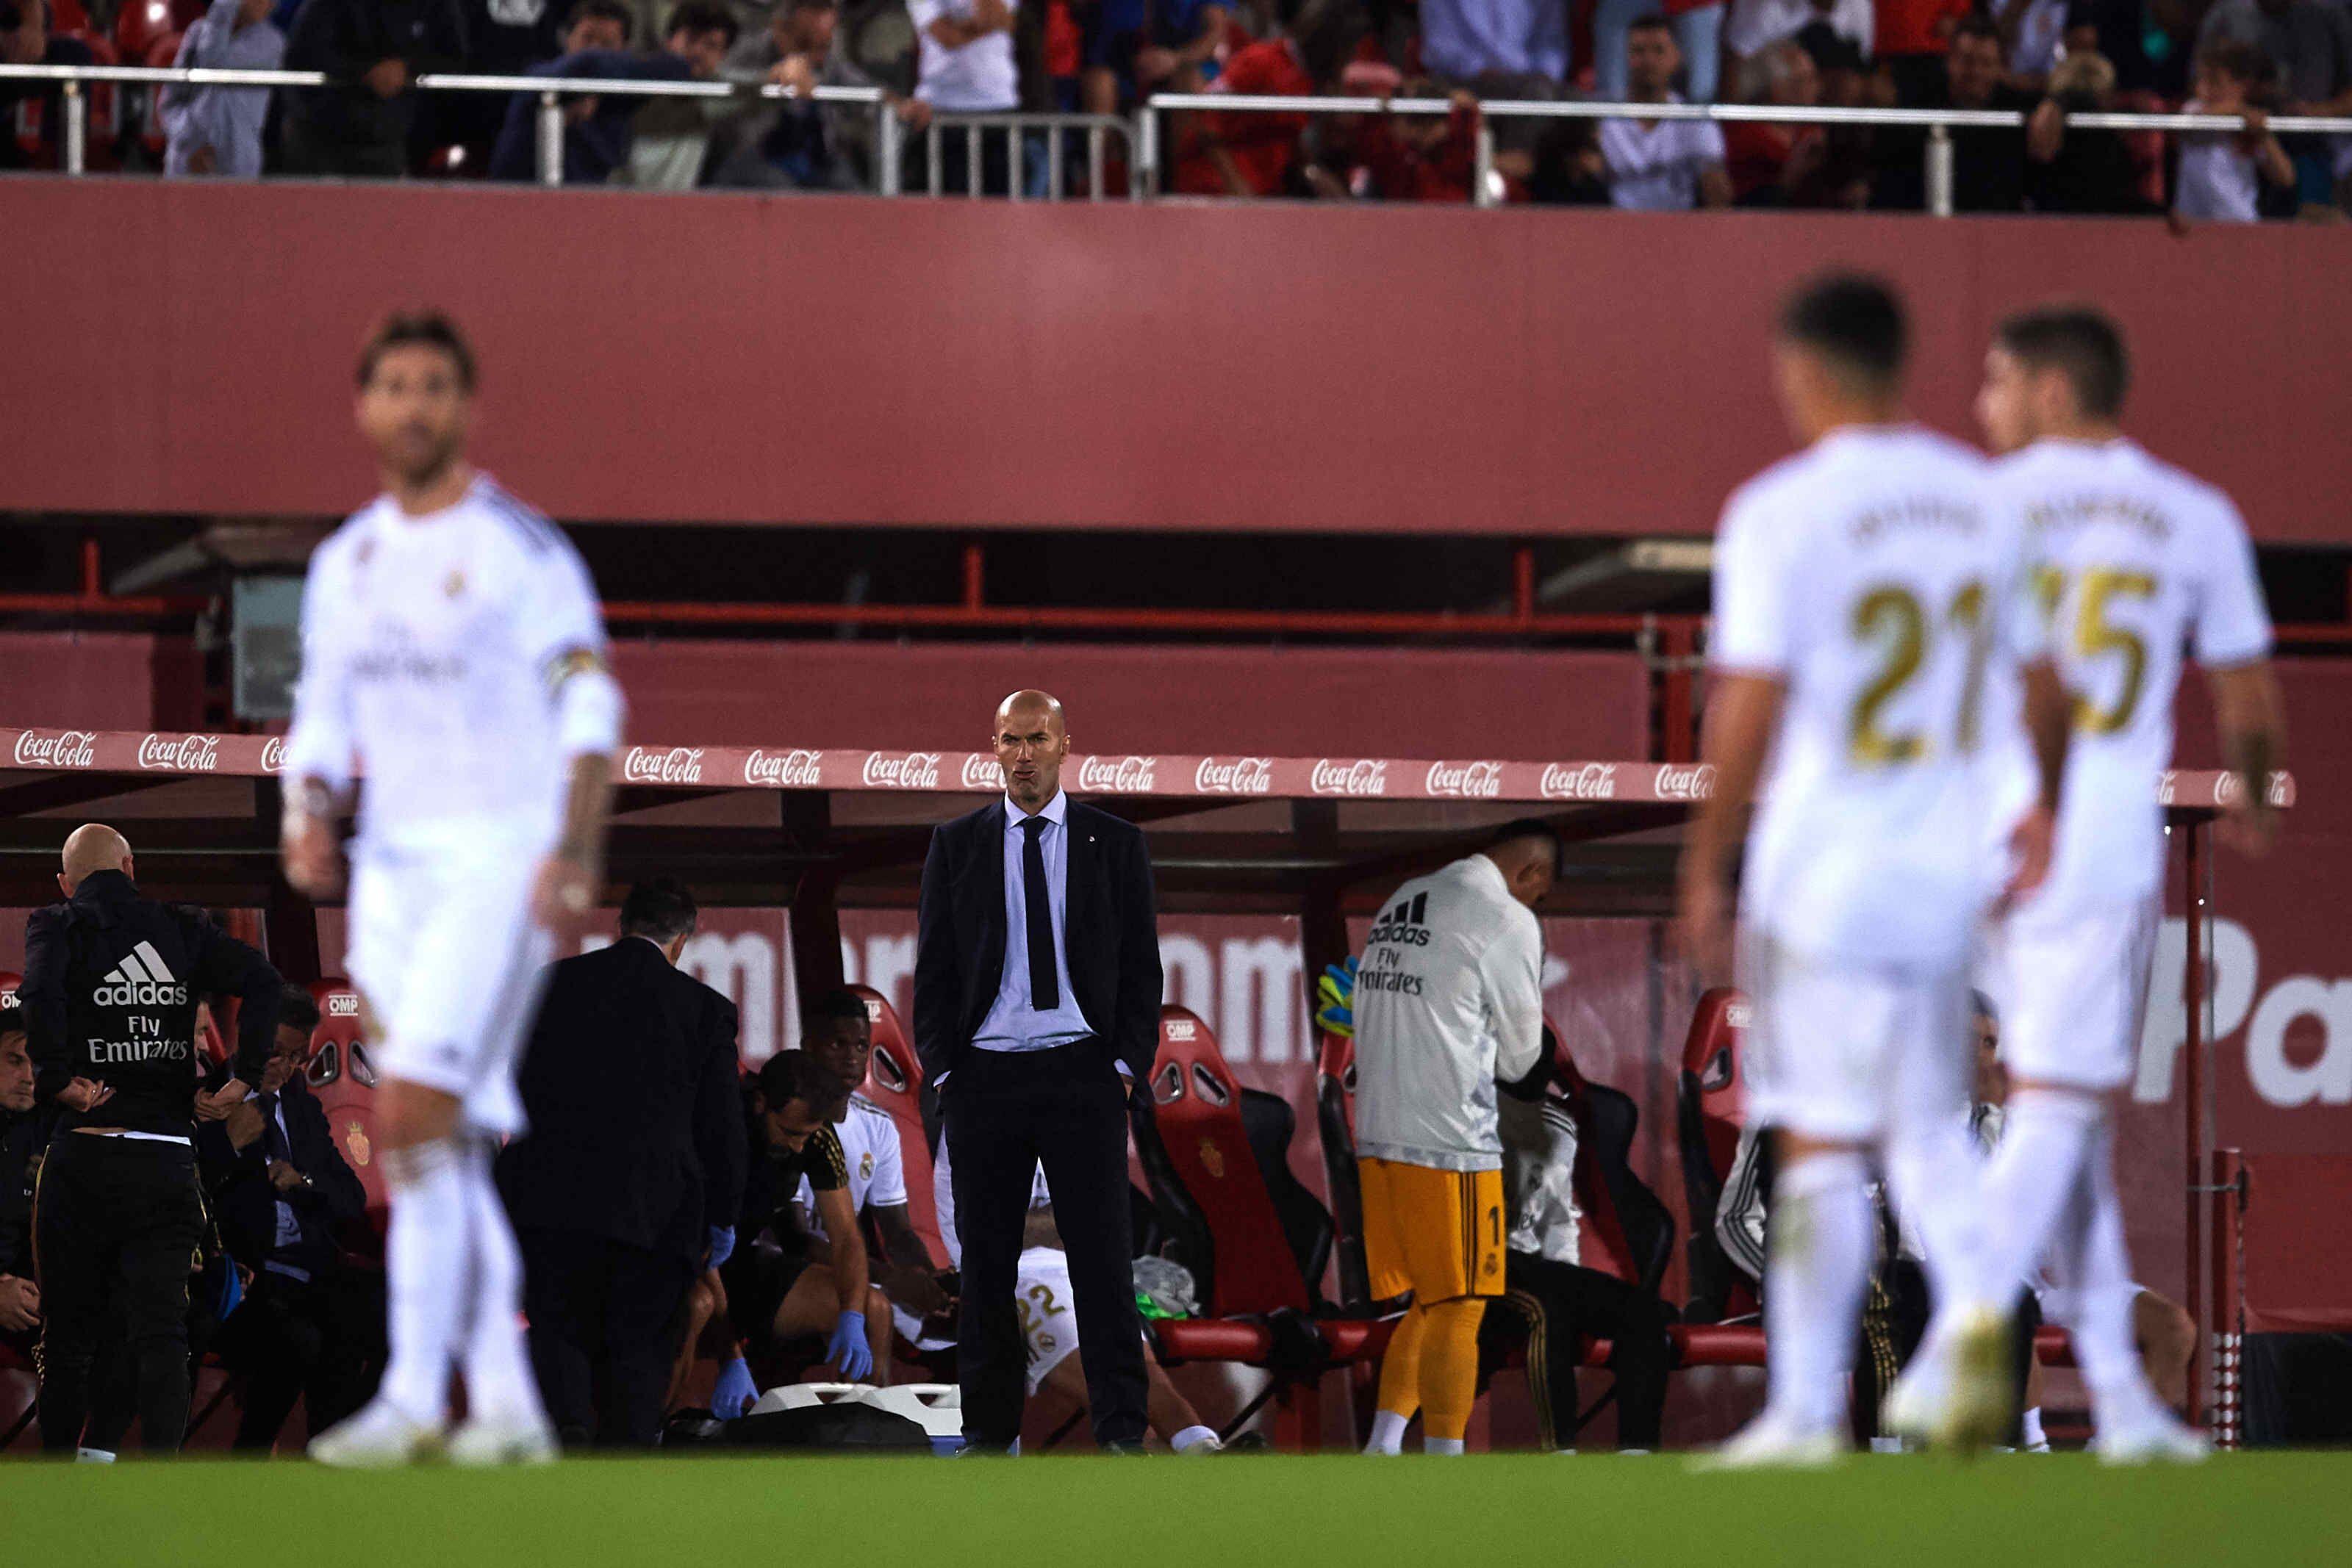 Zinedine Zidane's future at Real Madrid at risk